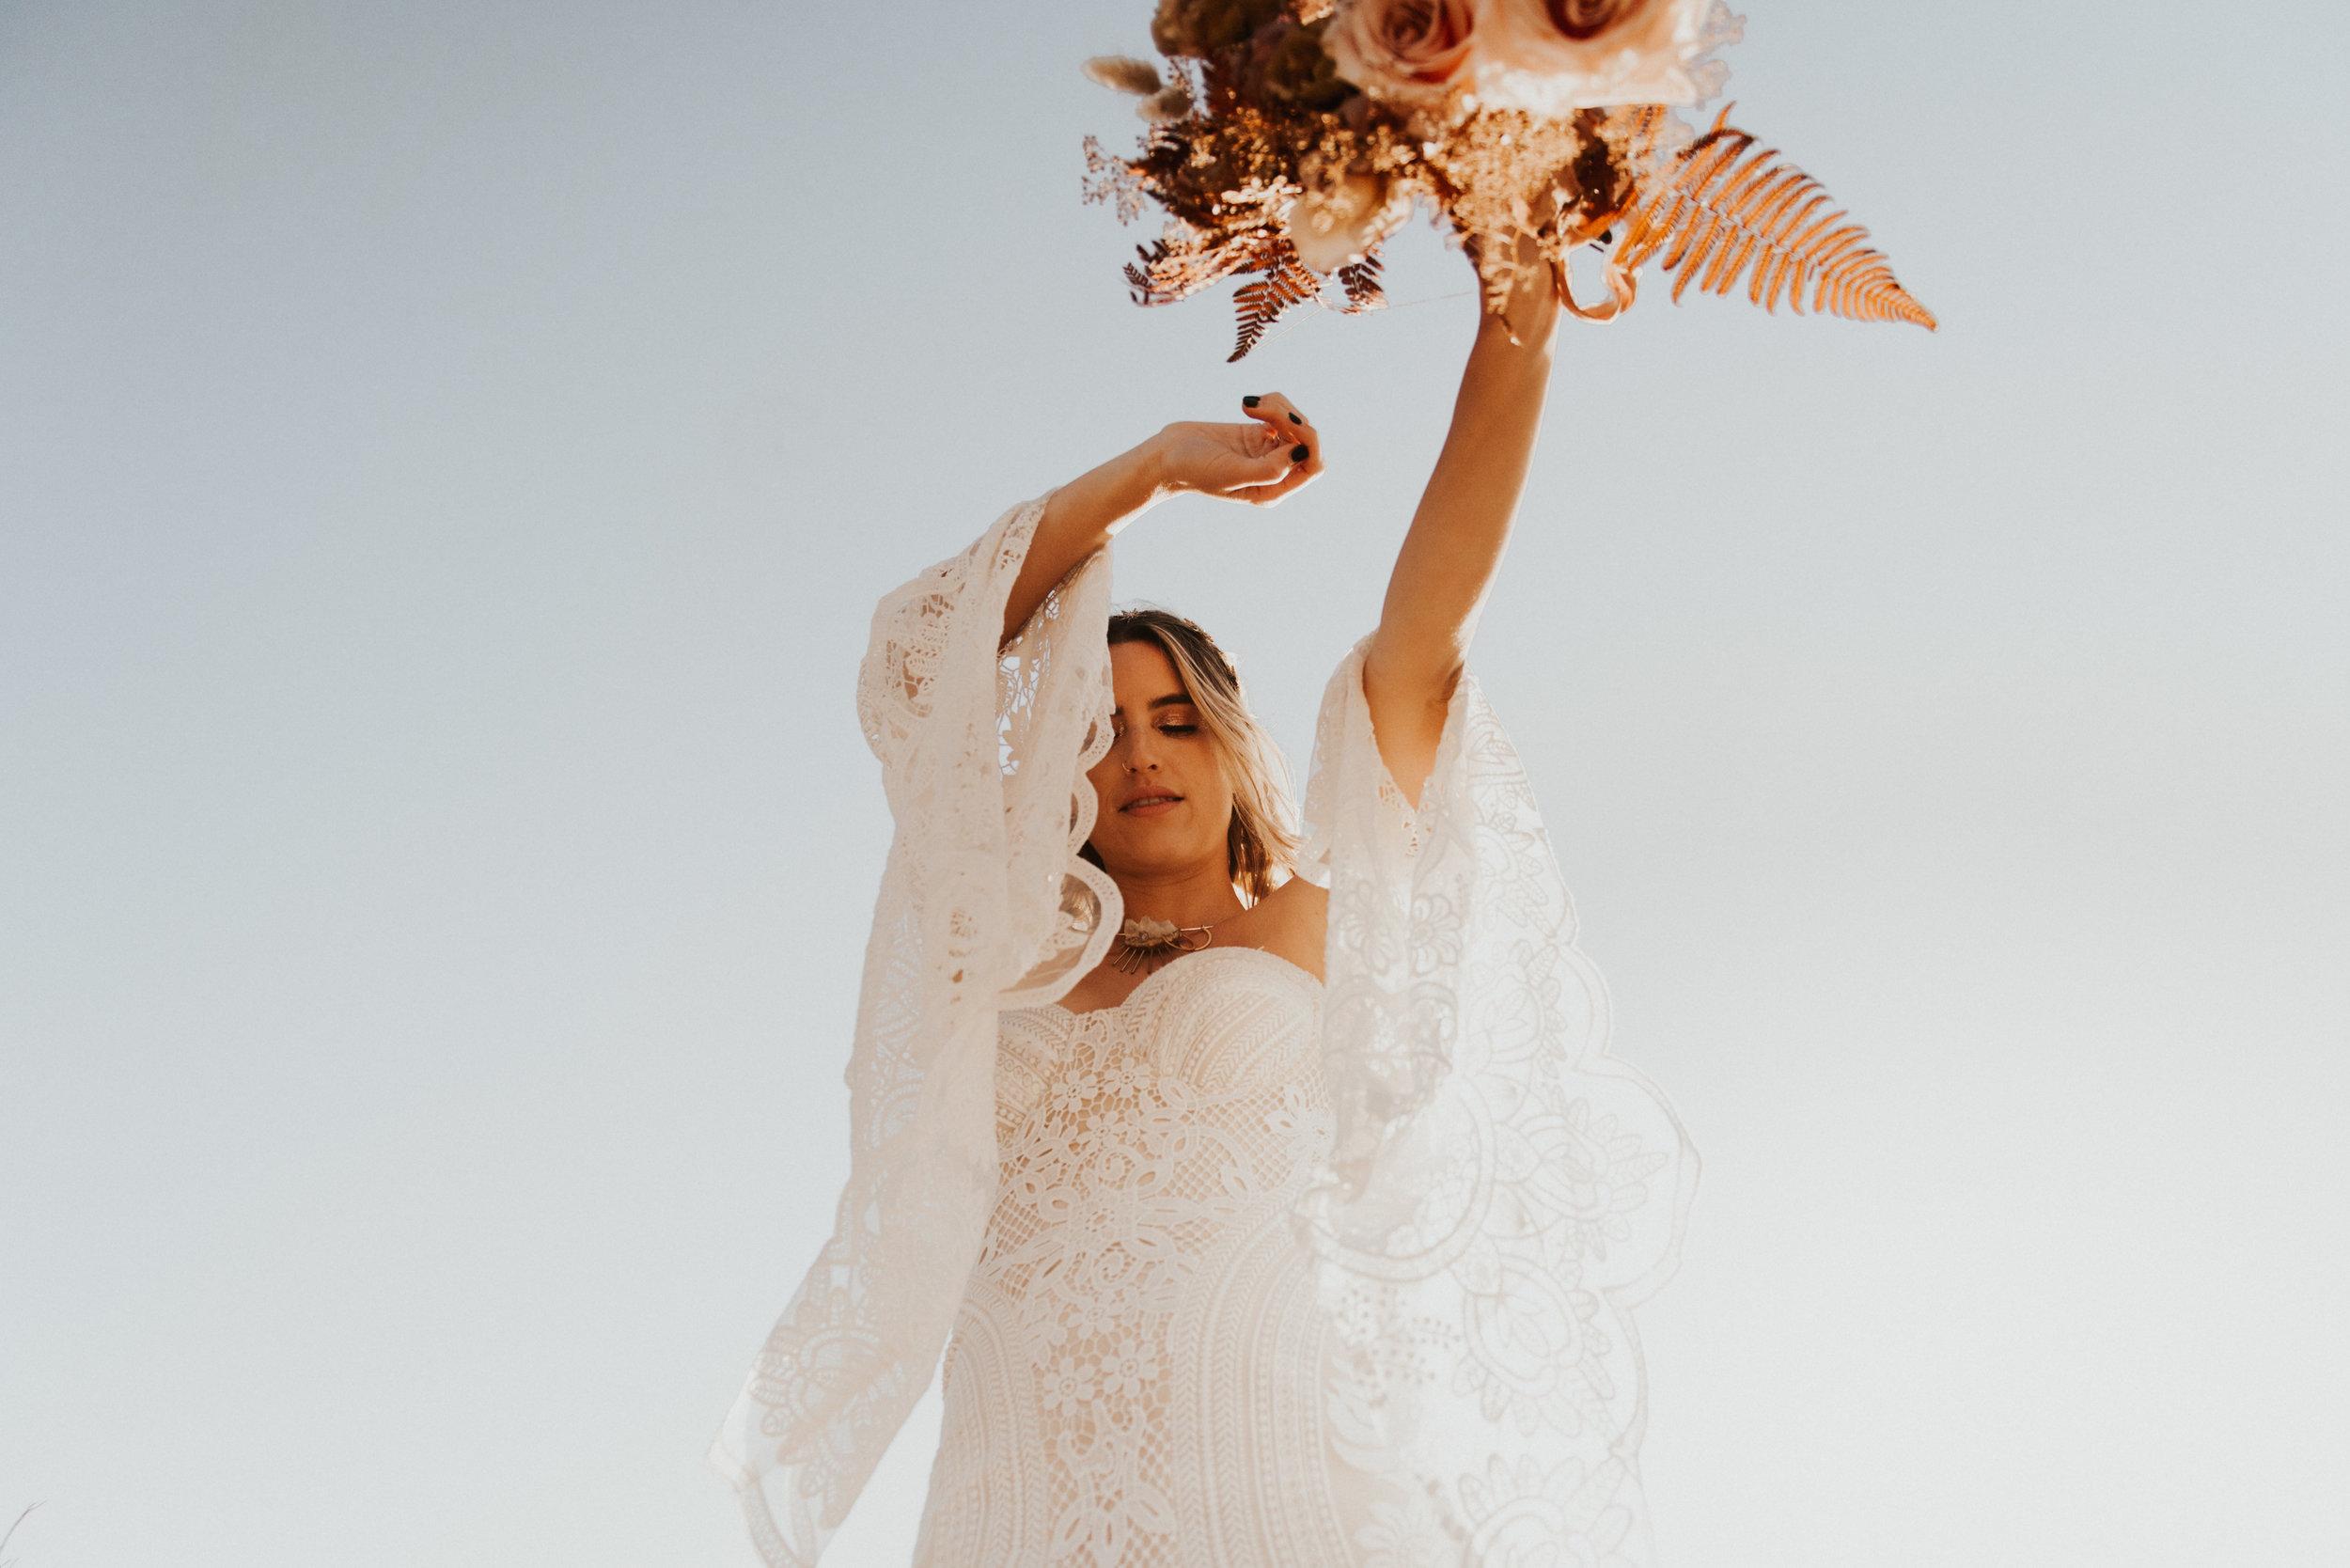 FortSt.John_photographer_TyraEPhotography_Wedding_Couple_Family_Photograhy_DawsonCreek_Elopement_Bride_Boduoir_Portraits-5015.jpg